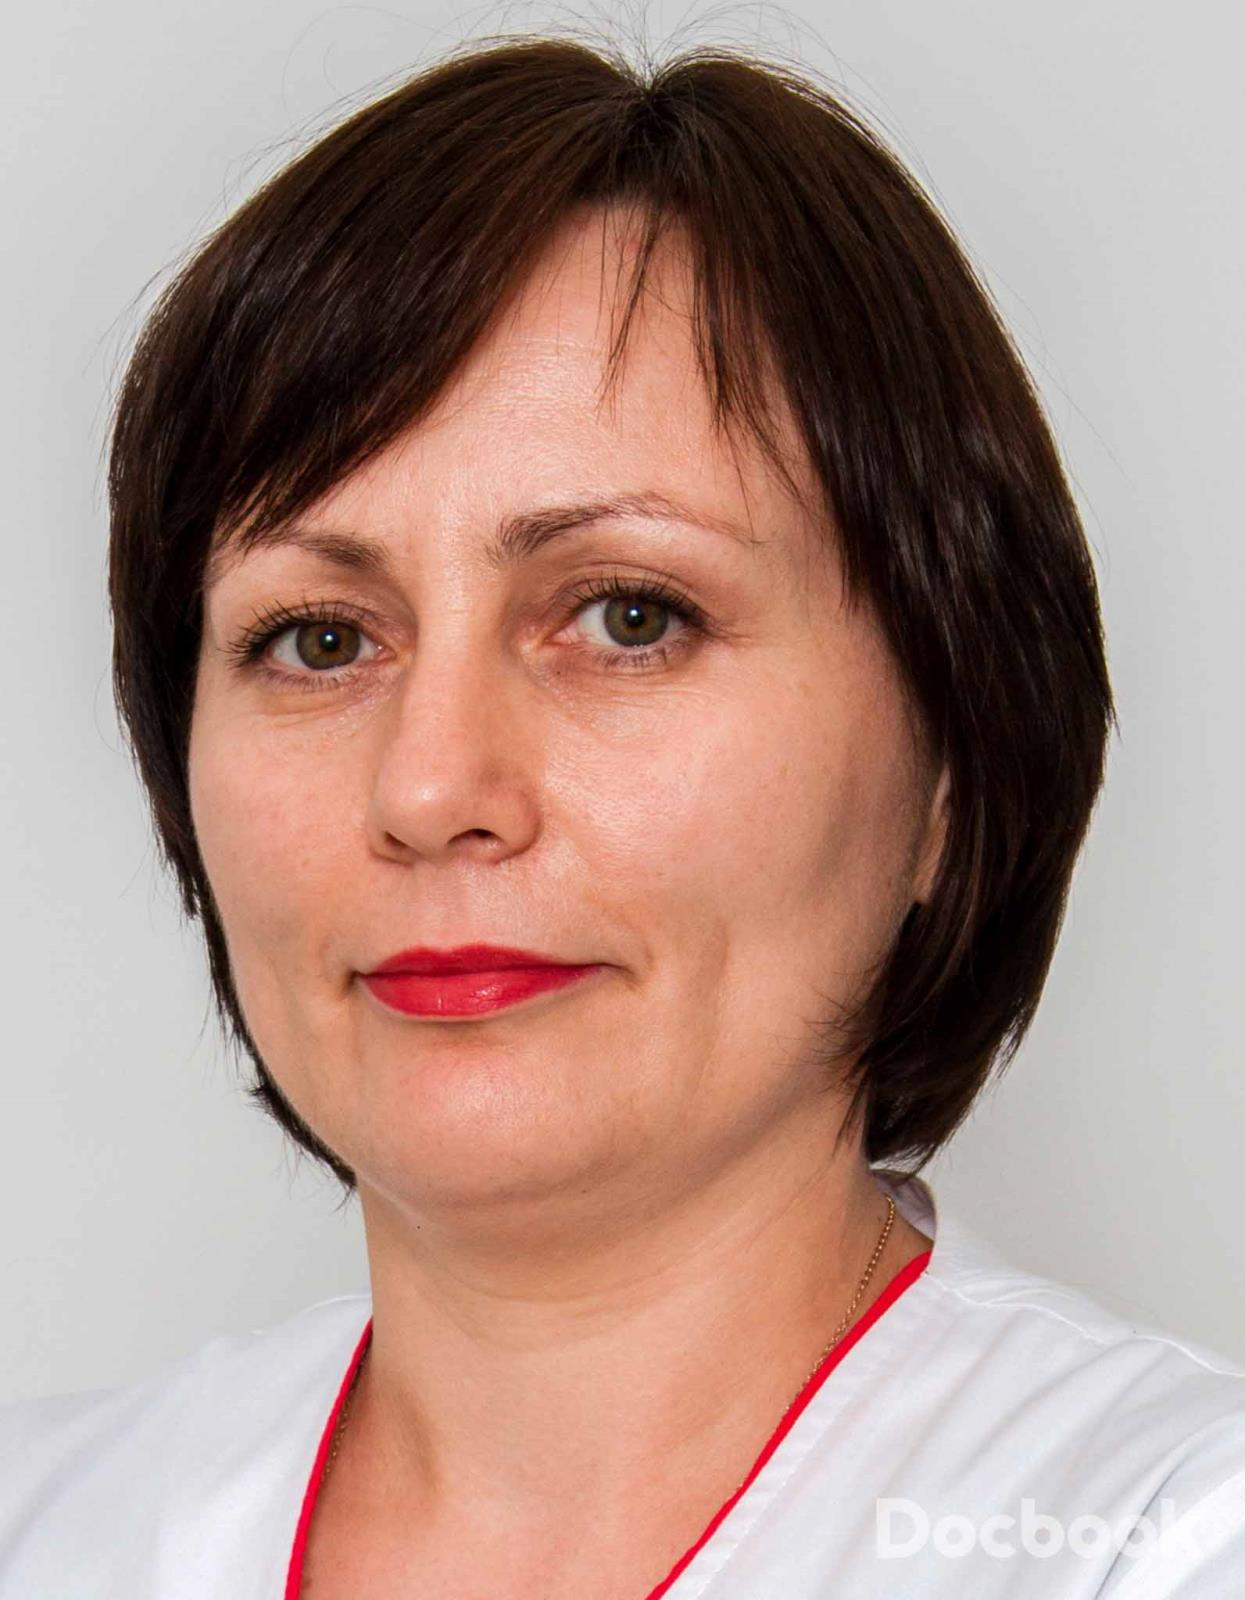 Dr. Liudmila Cretu